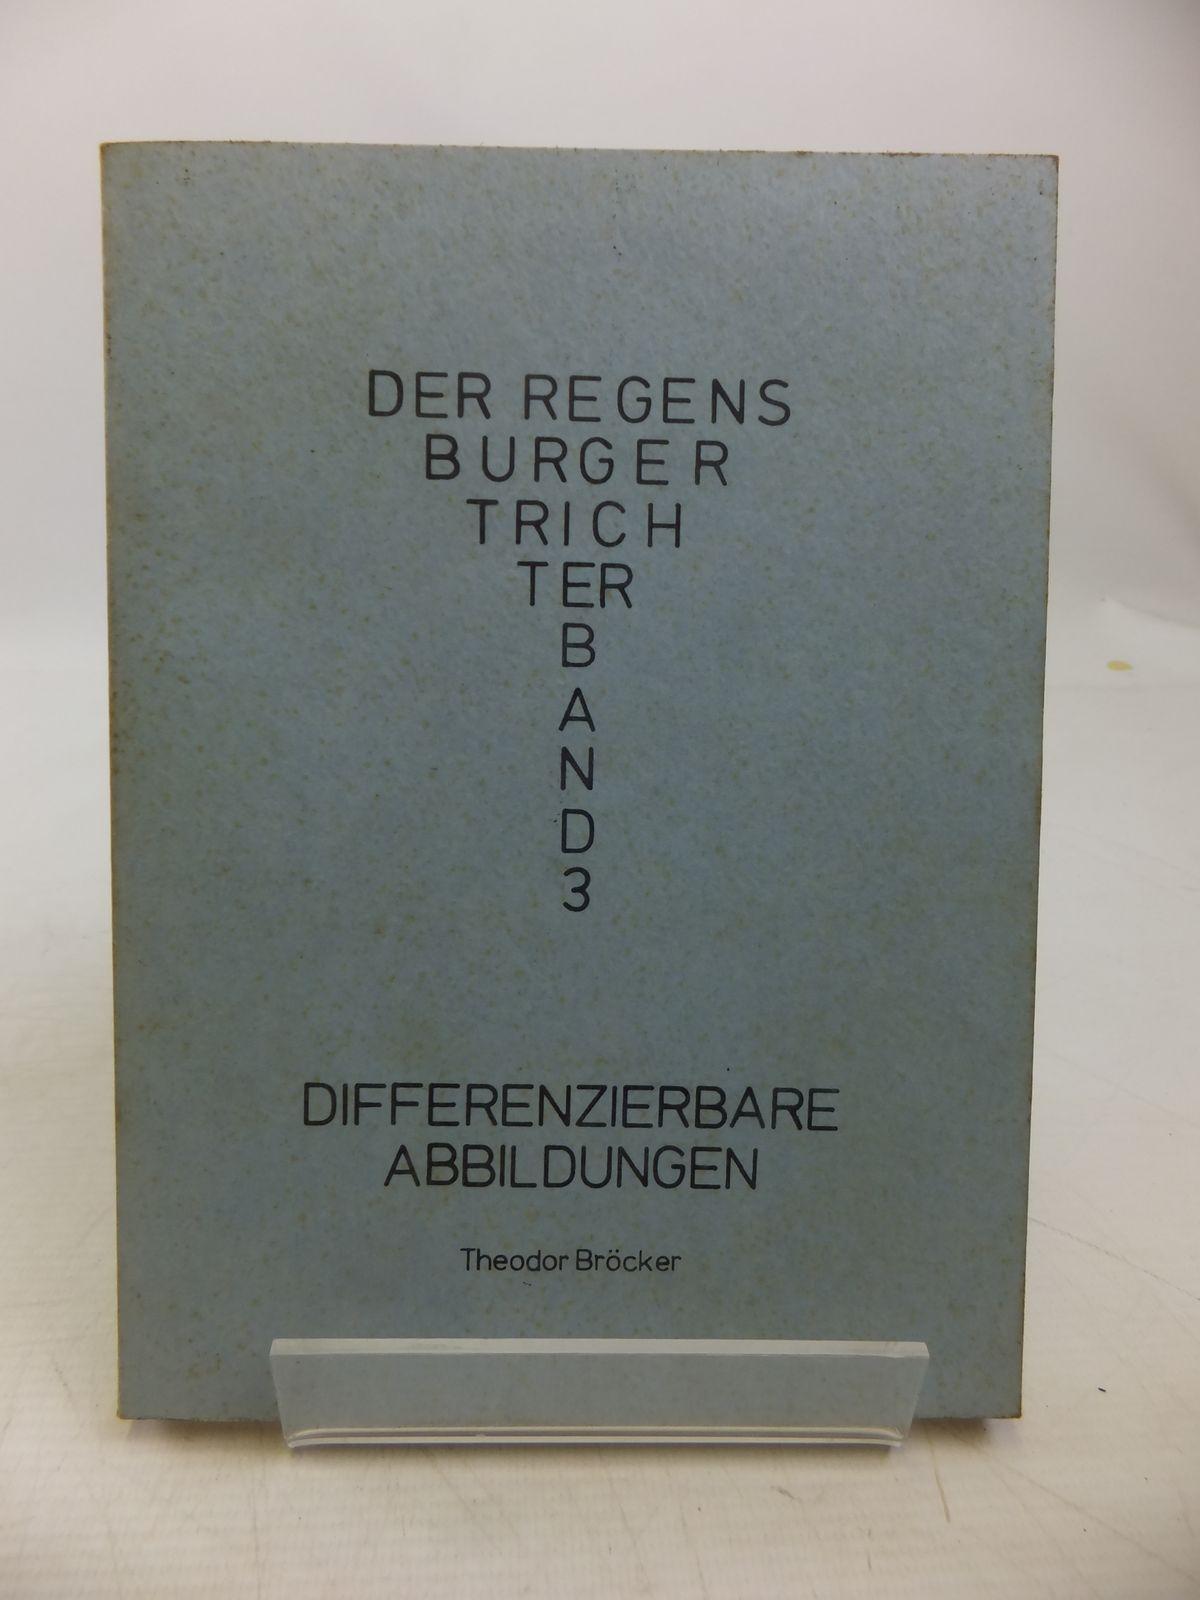 Photo of DIFFERENZIERBARE ABBILDUNGEN written by Brocker, Theodor published by Universitat Regensburg (STOCK CODE: 1811323)  for sale by Stella & Rose's Books